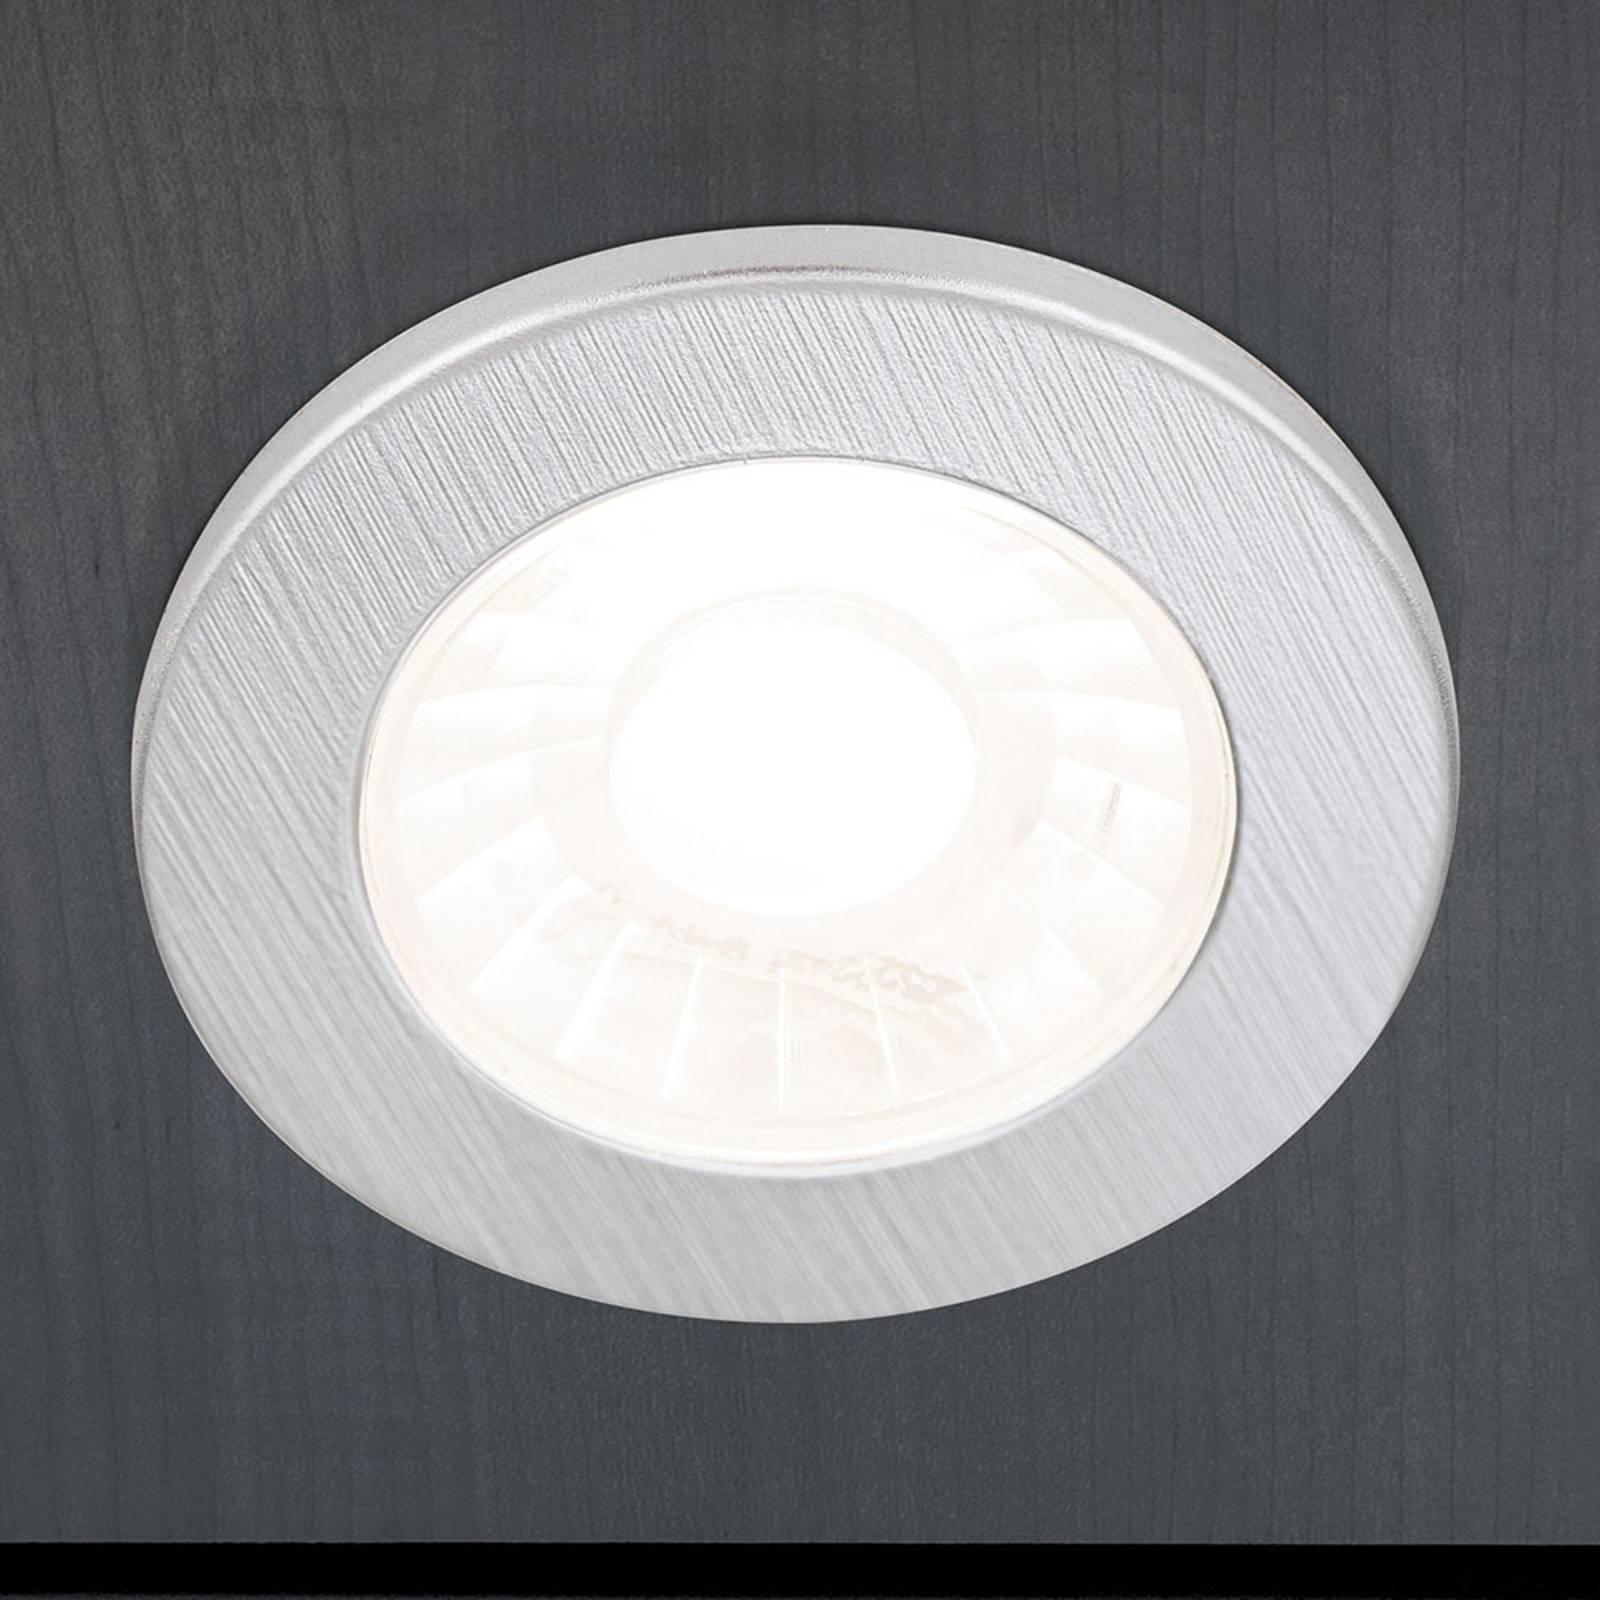 LED-kalusteuppovalaisin Artist, 3 kpl, hopea